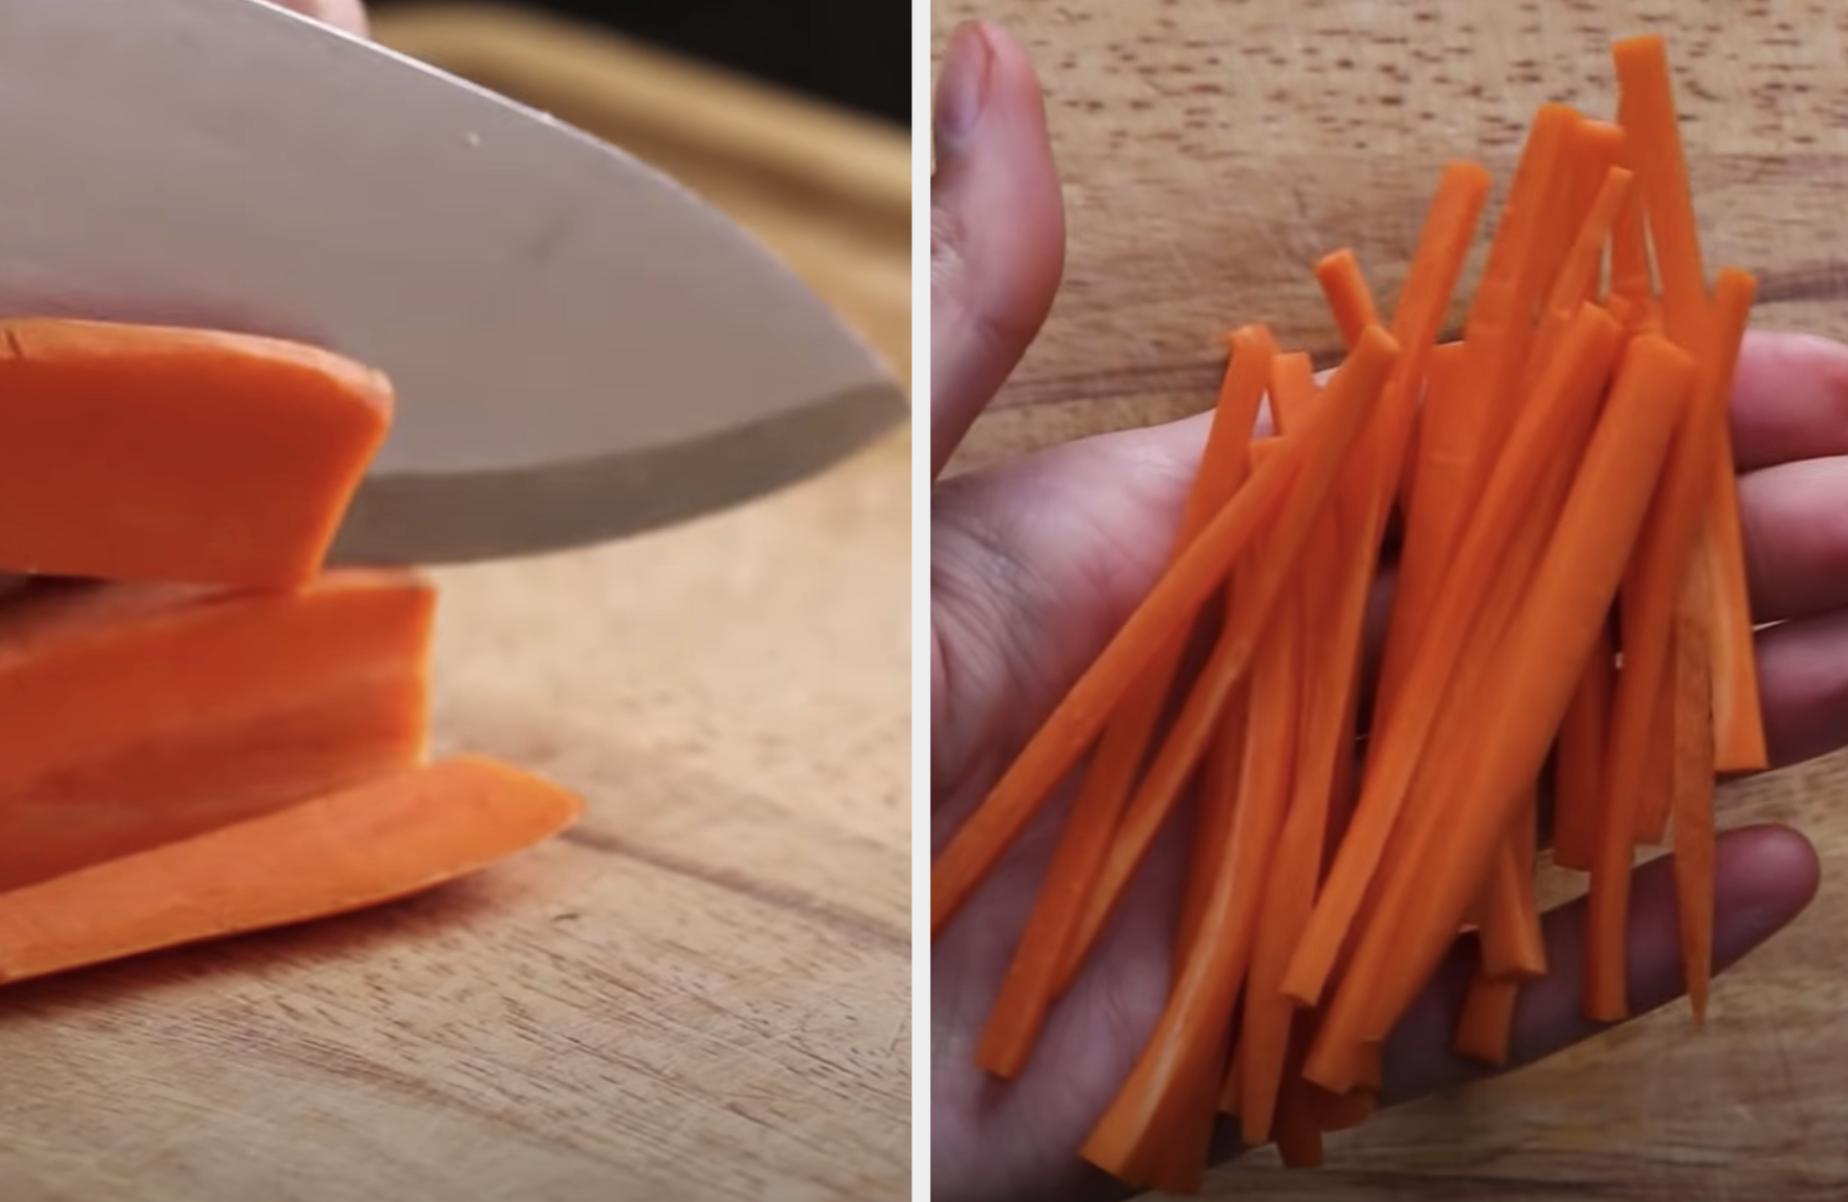 A sharp knife slicing through carrots